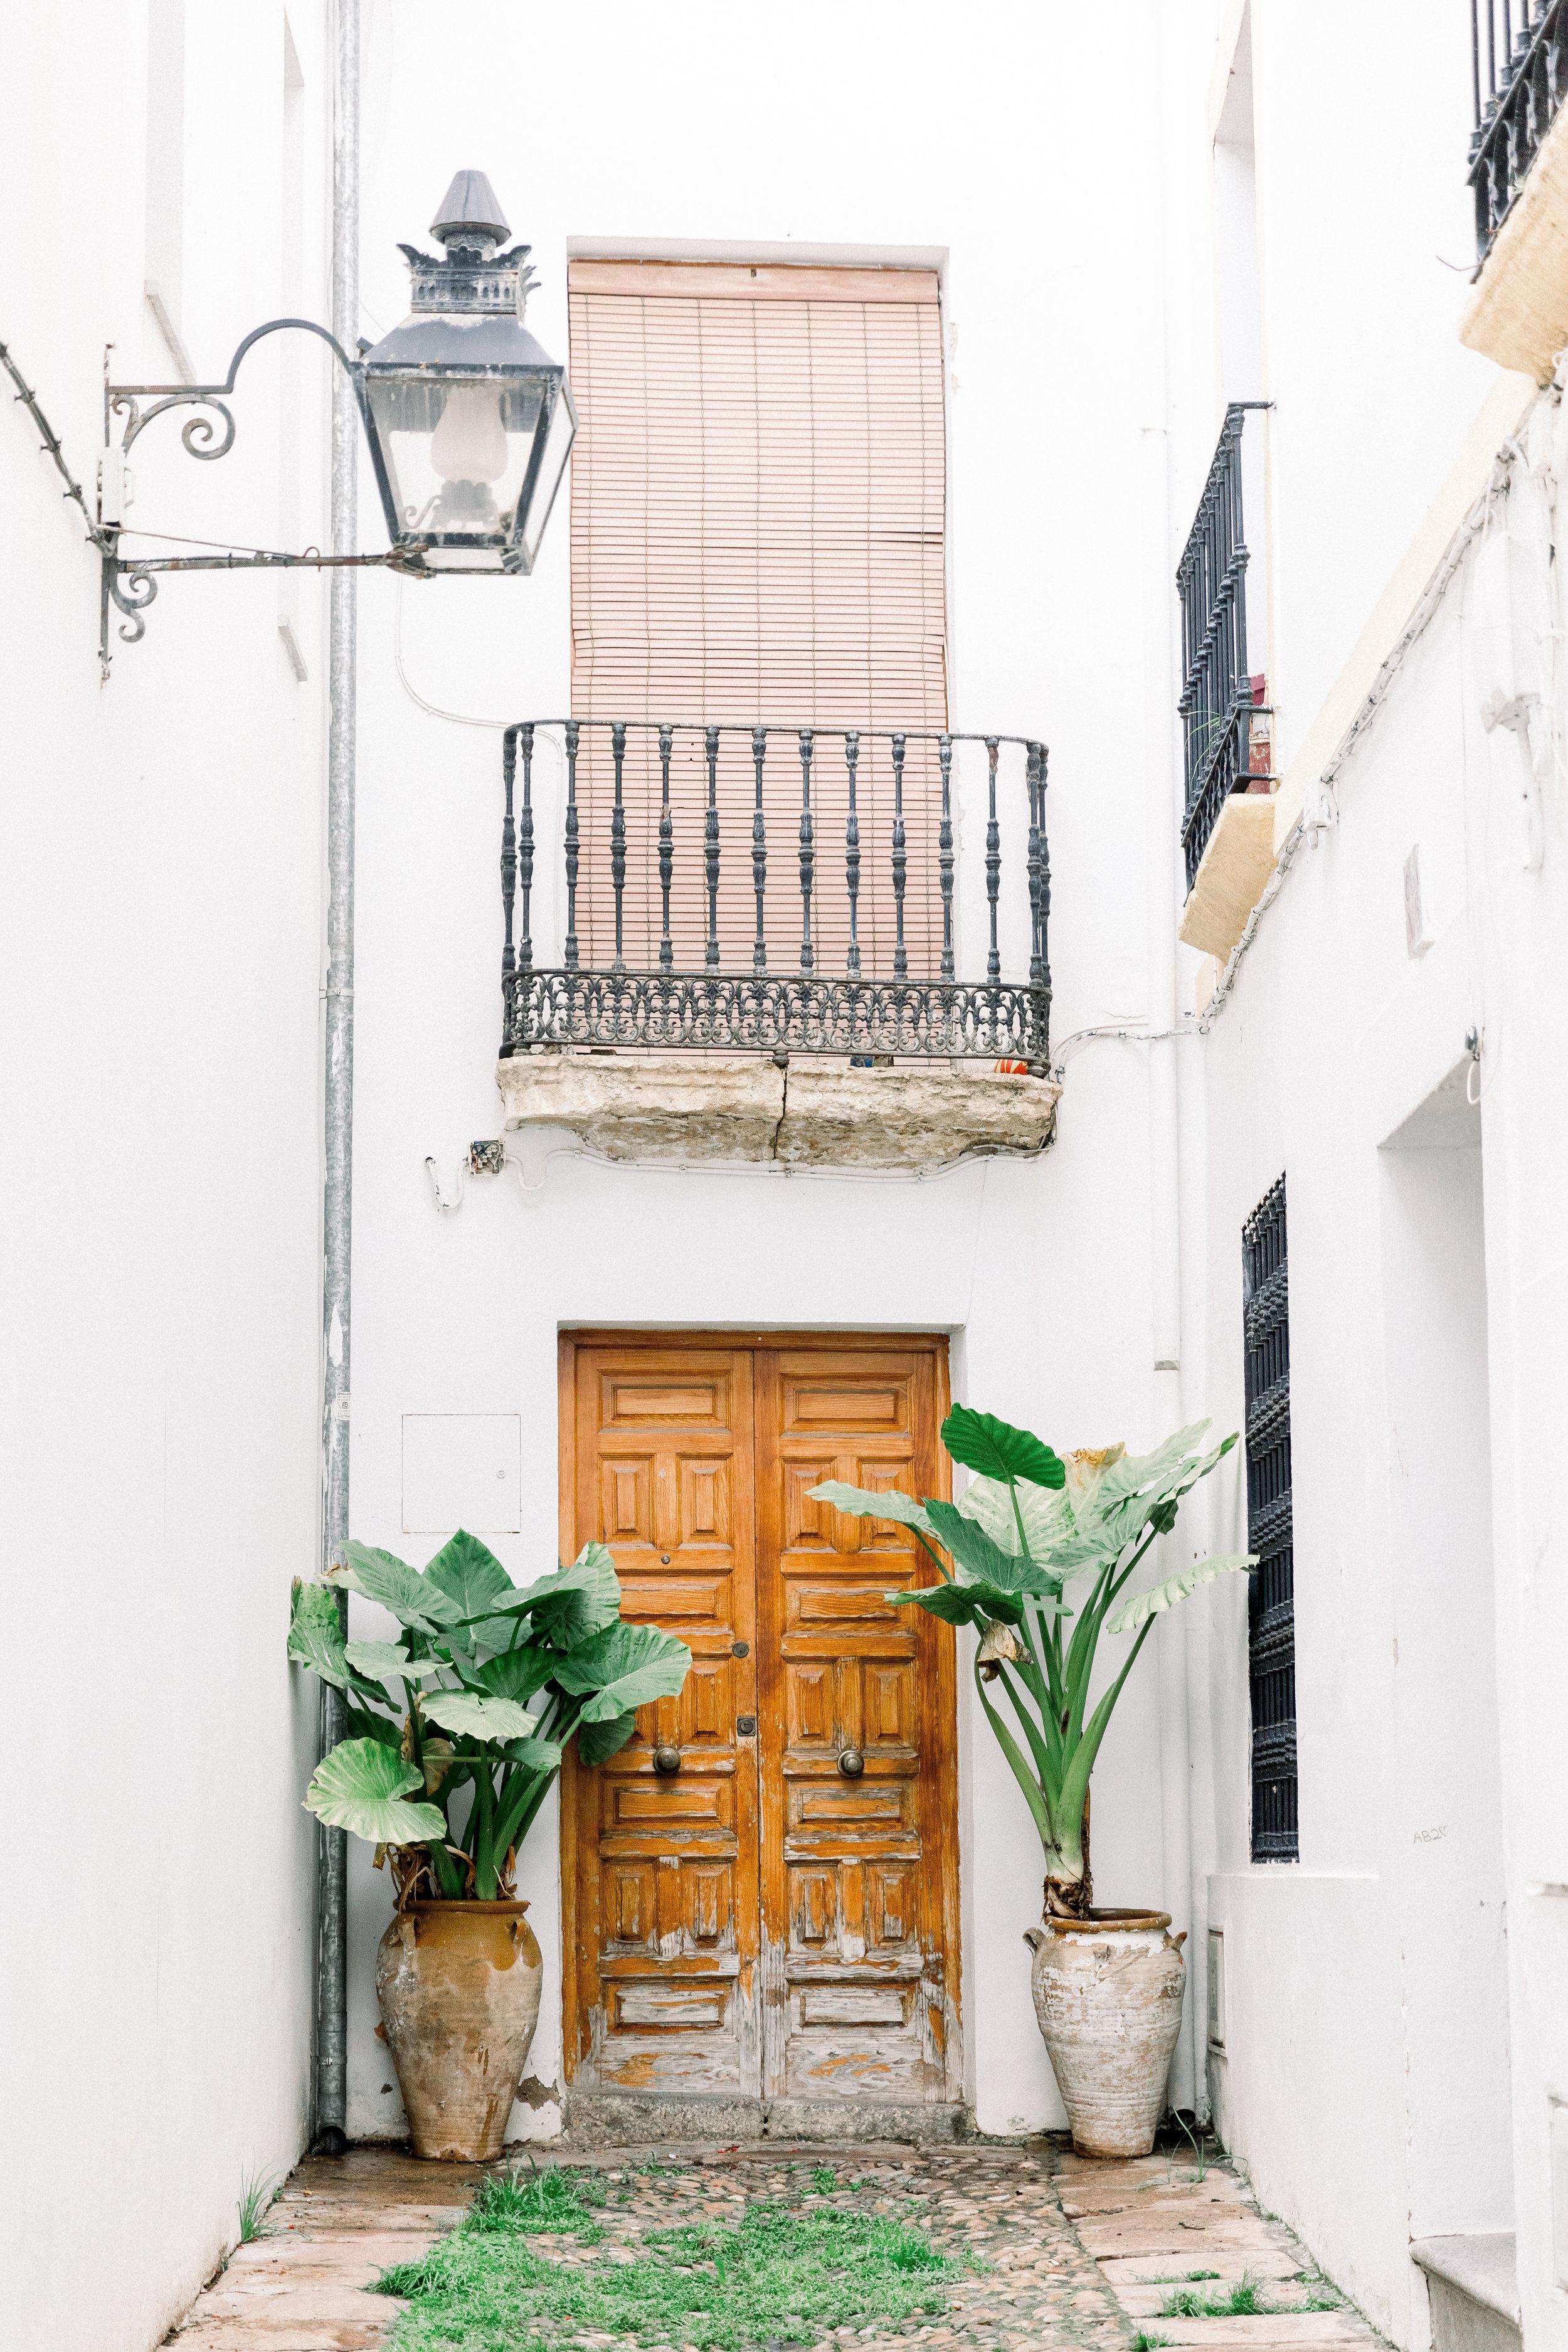 Destination-Traveling-Spain-Lifestyle-Photographer-86.jpg